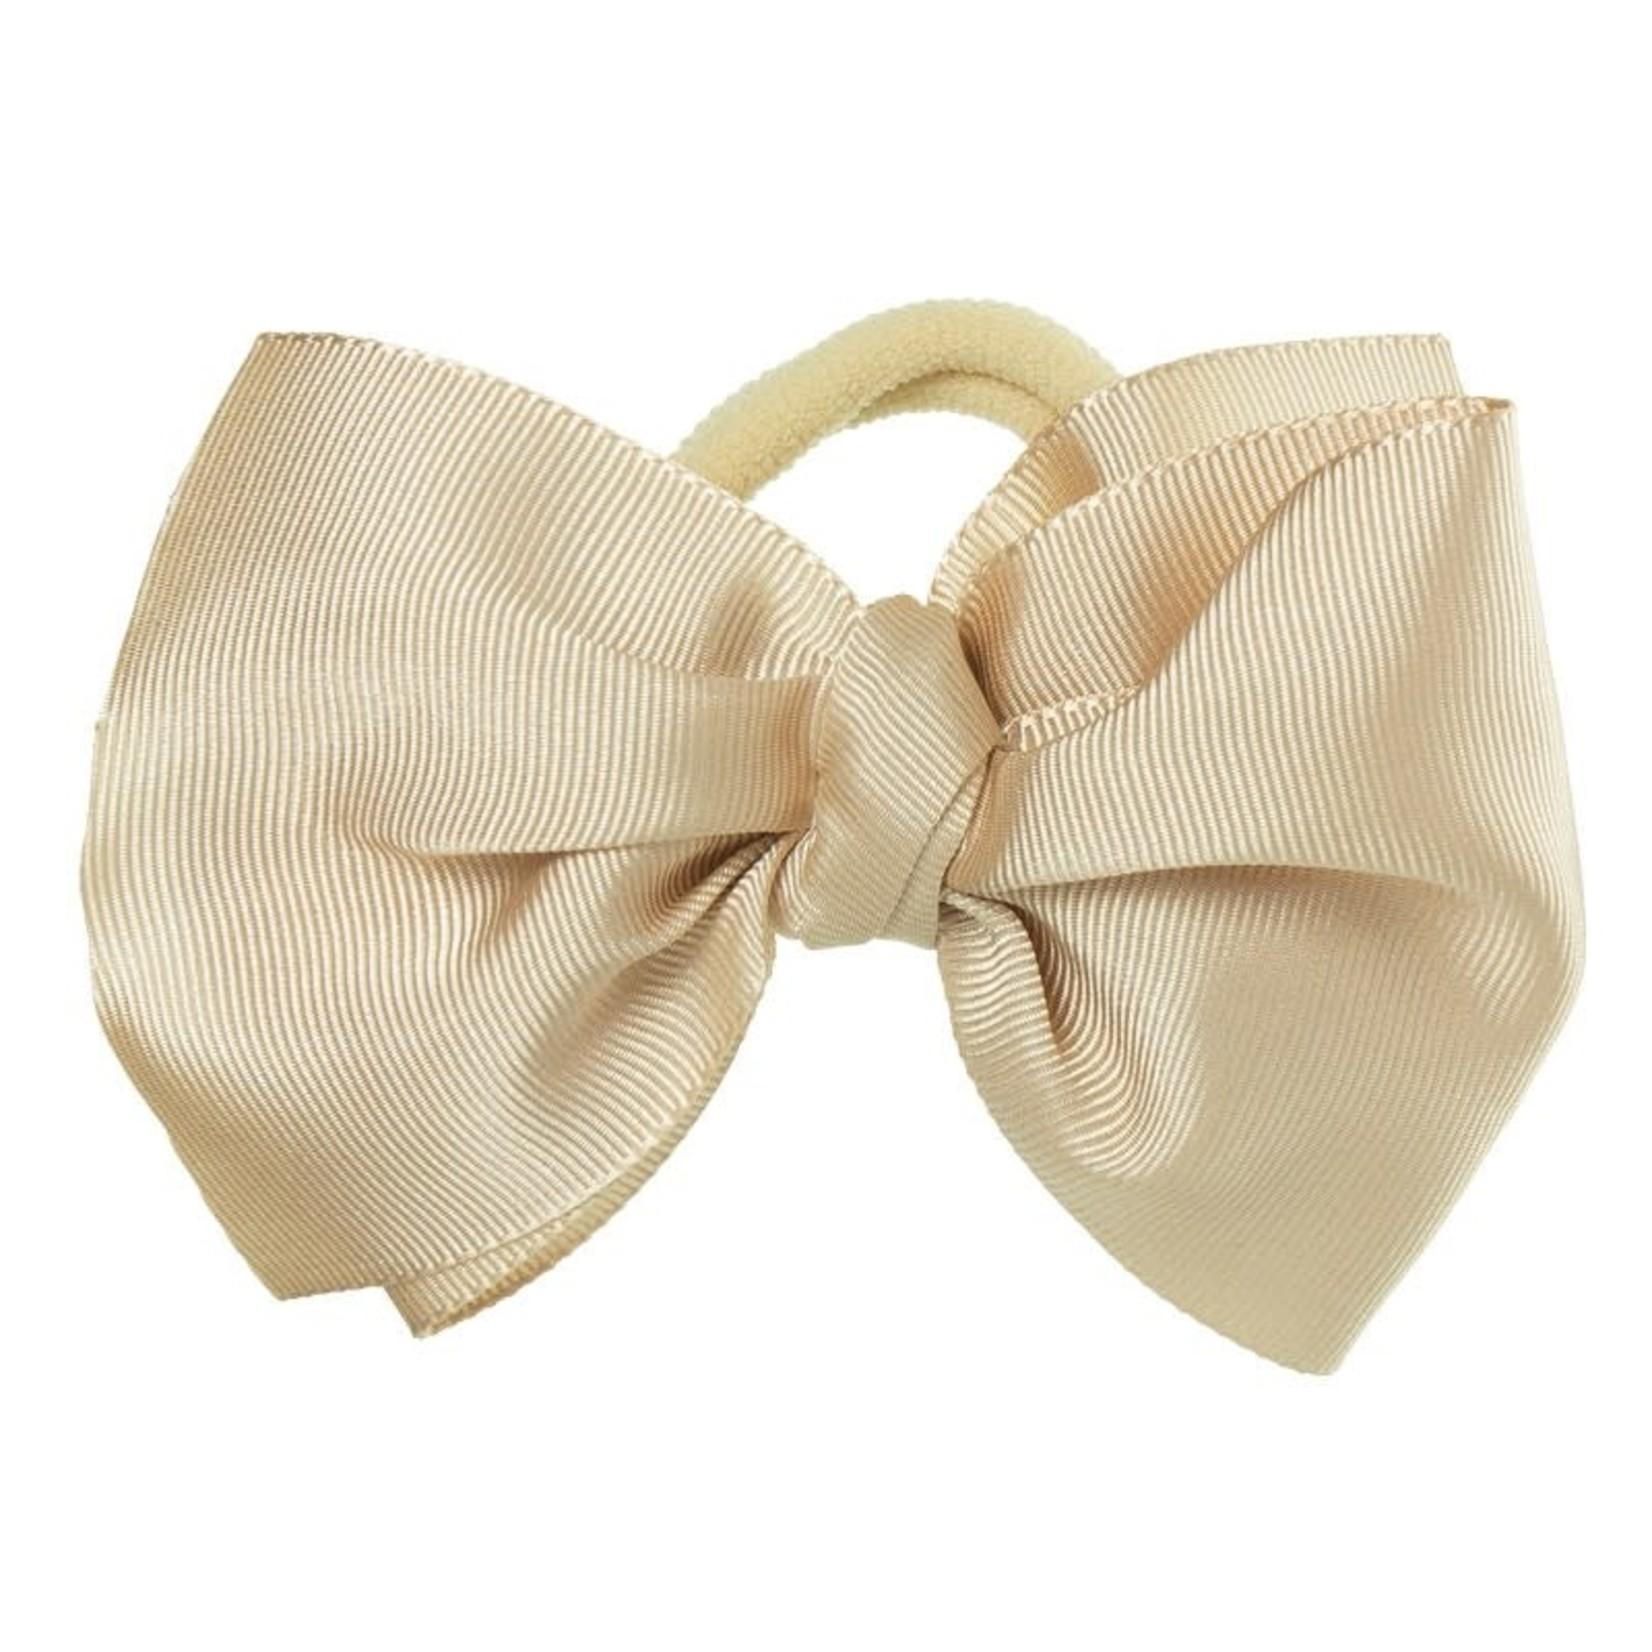 Siena Hair Bow - Beige